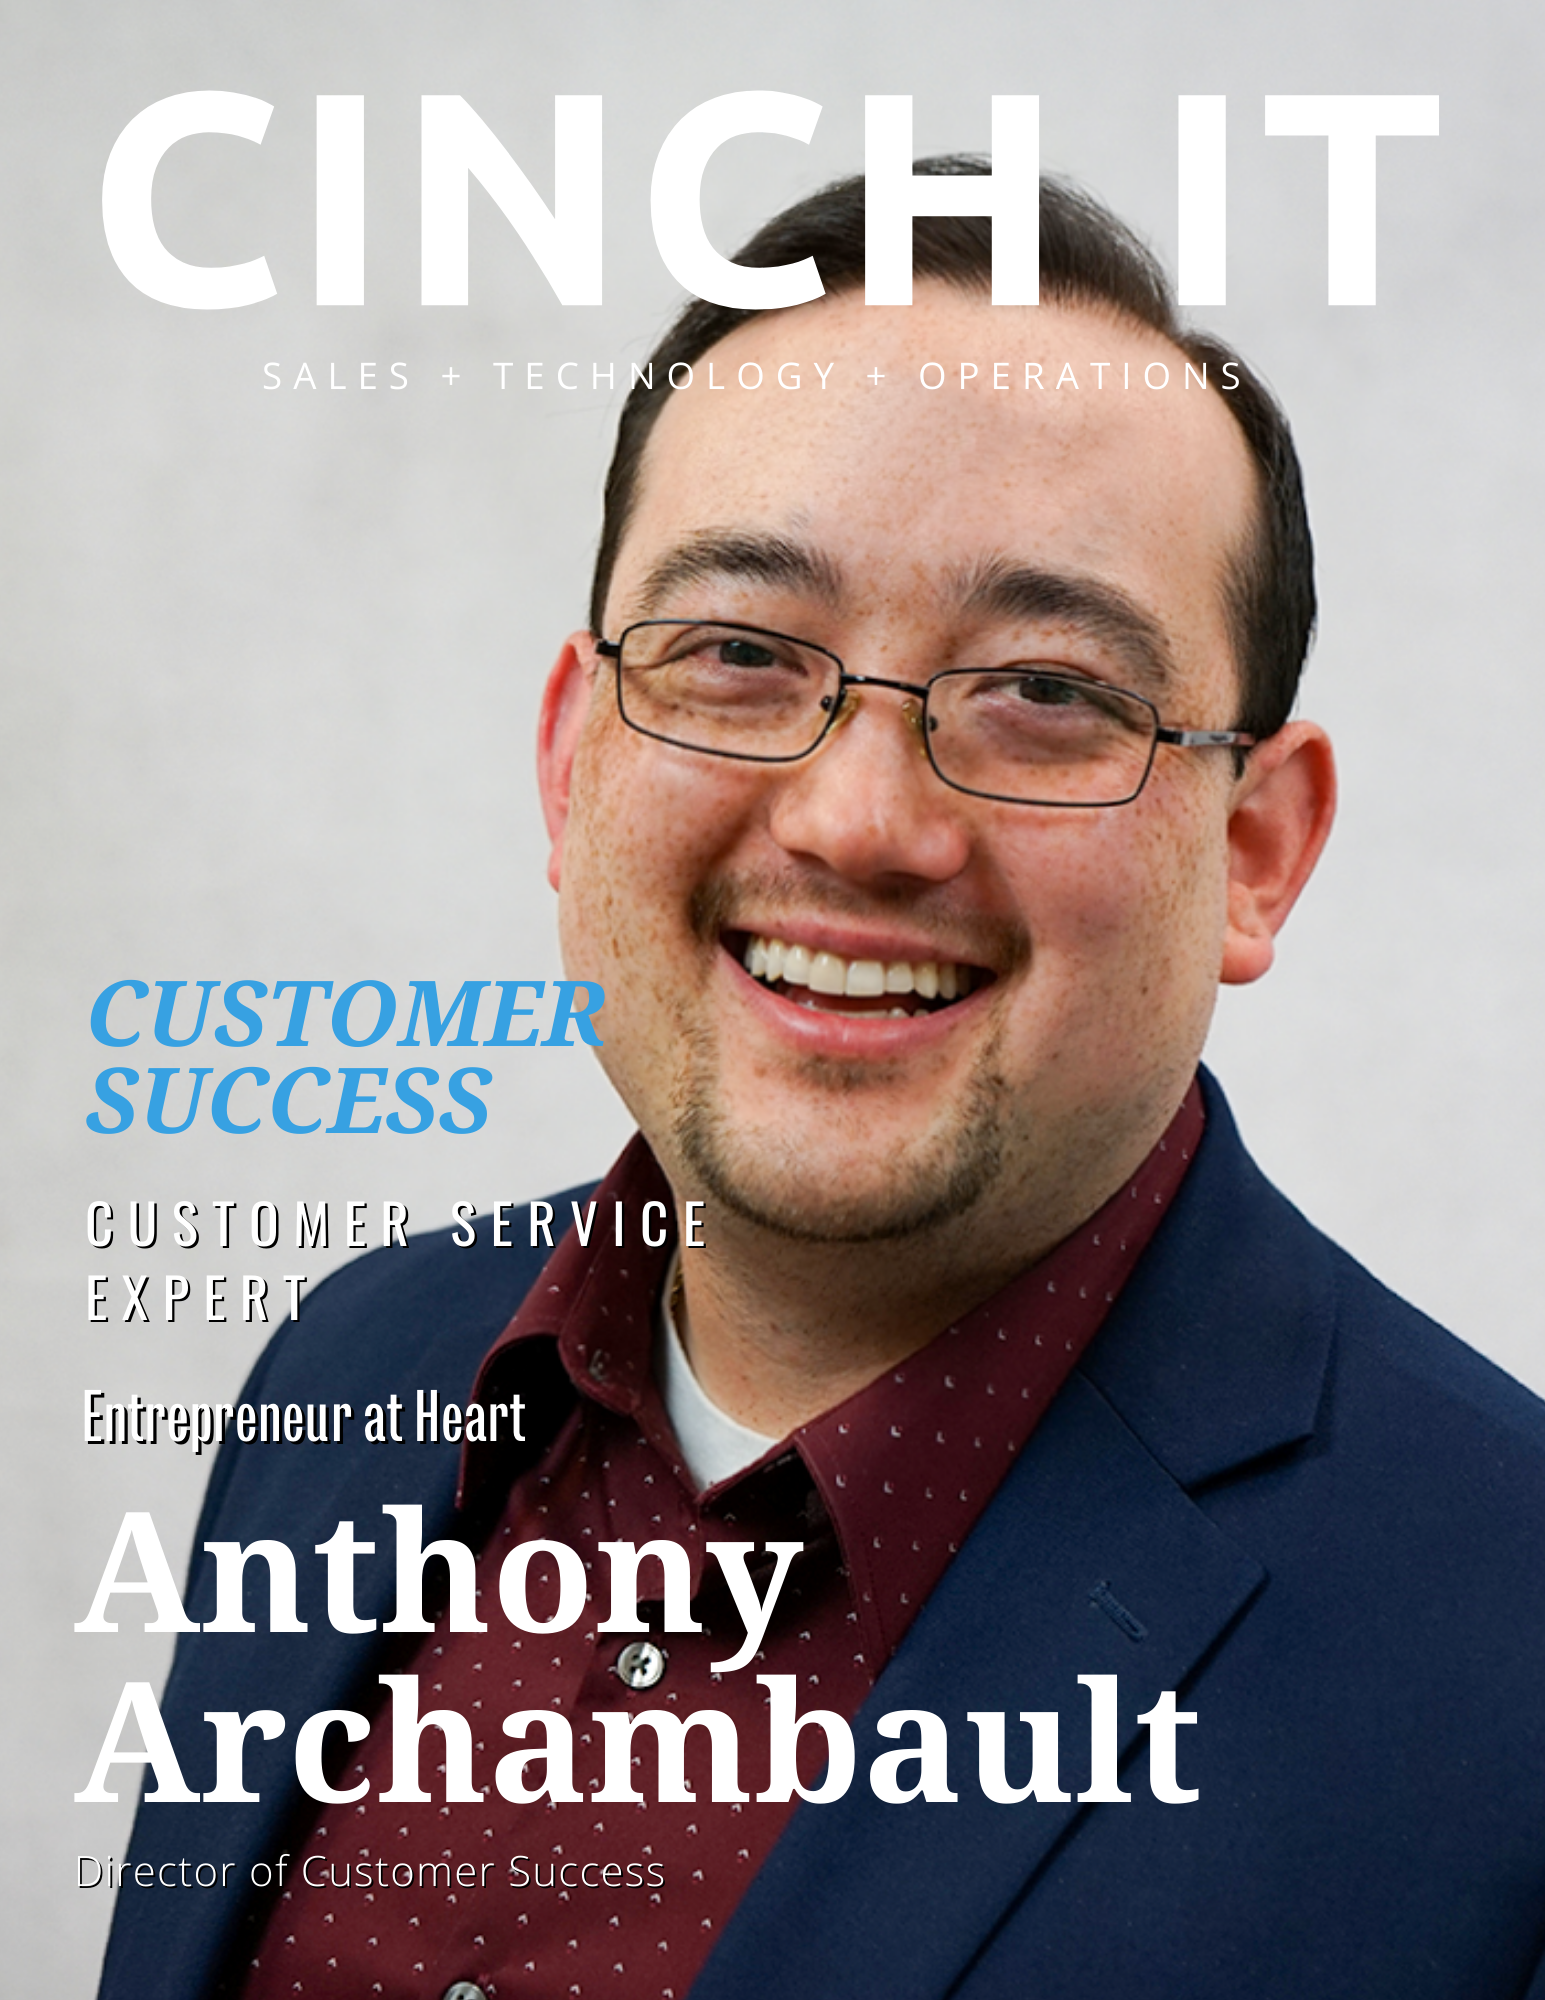 Anthony Archambault